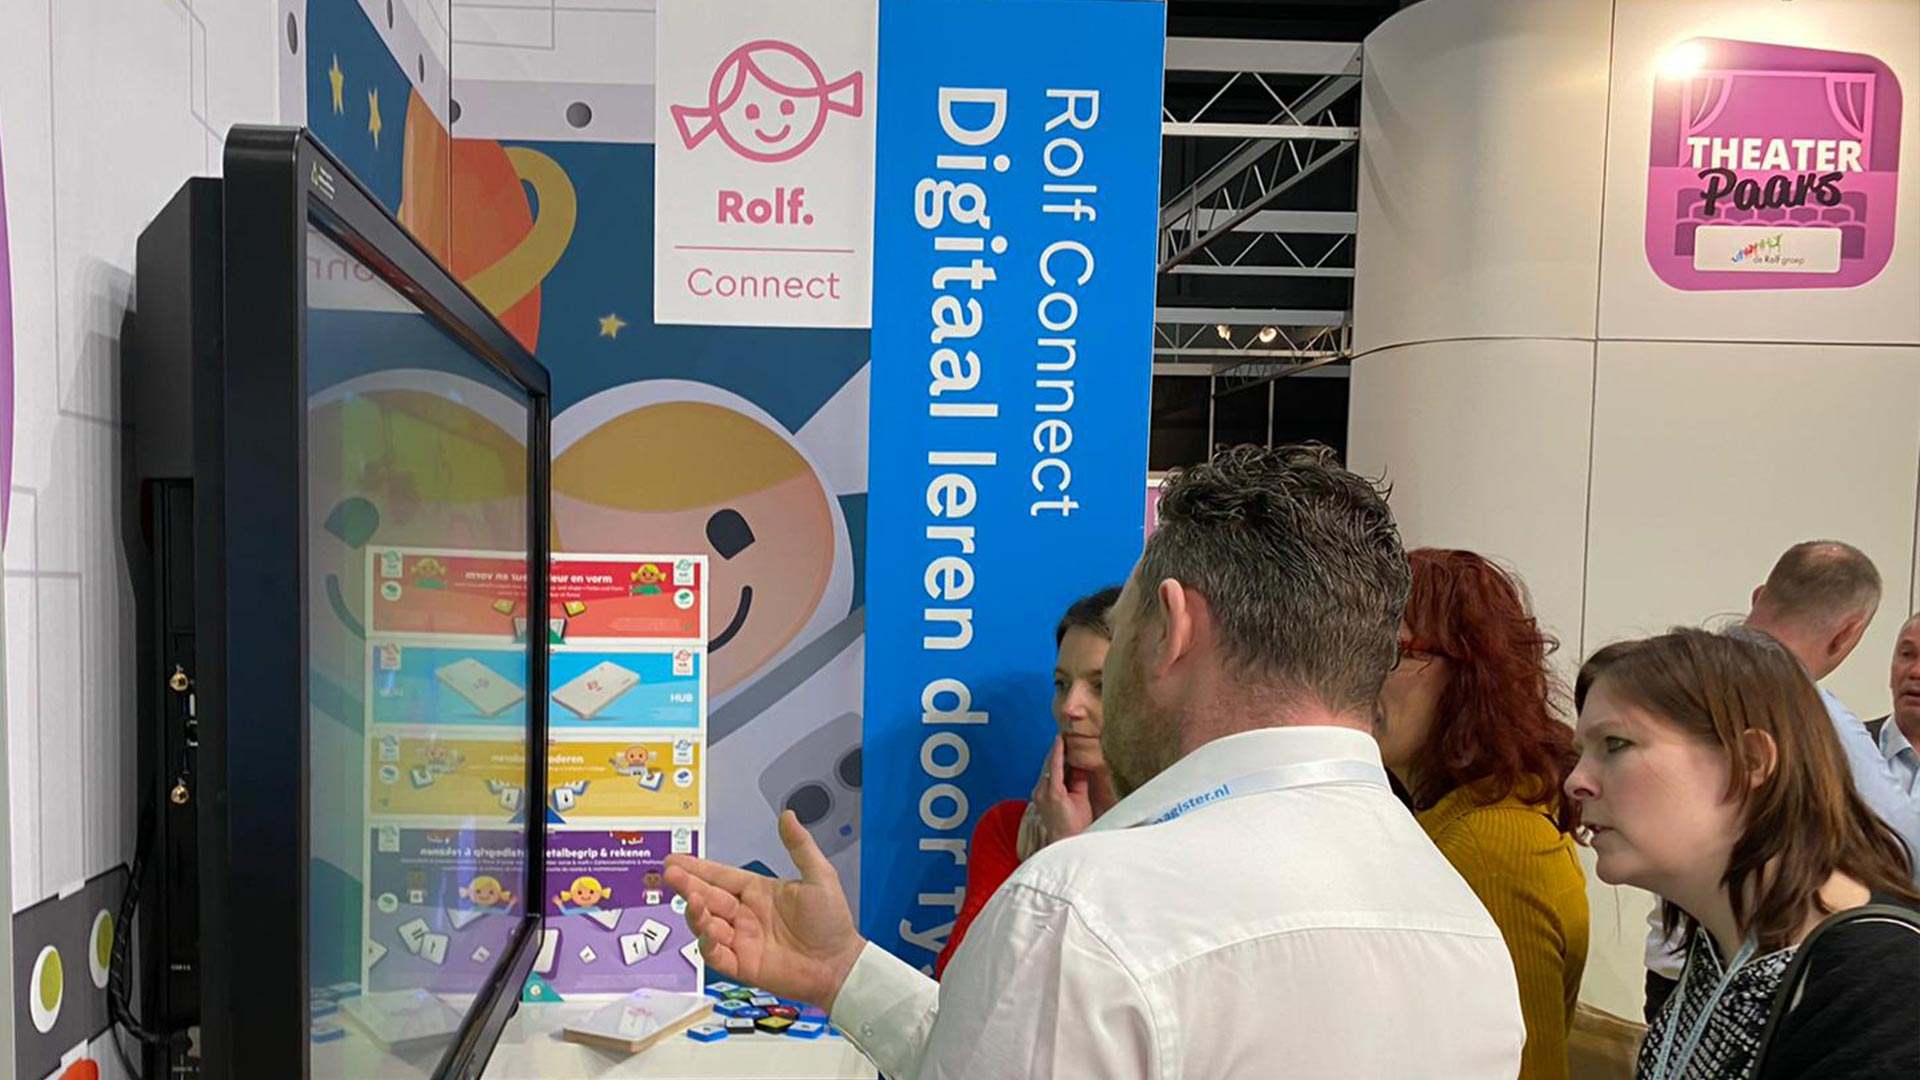 Rolf Connect hub